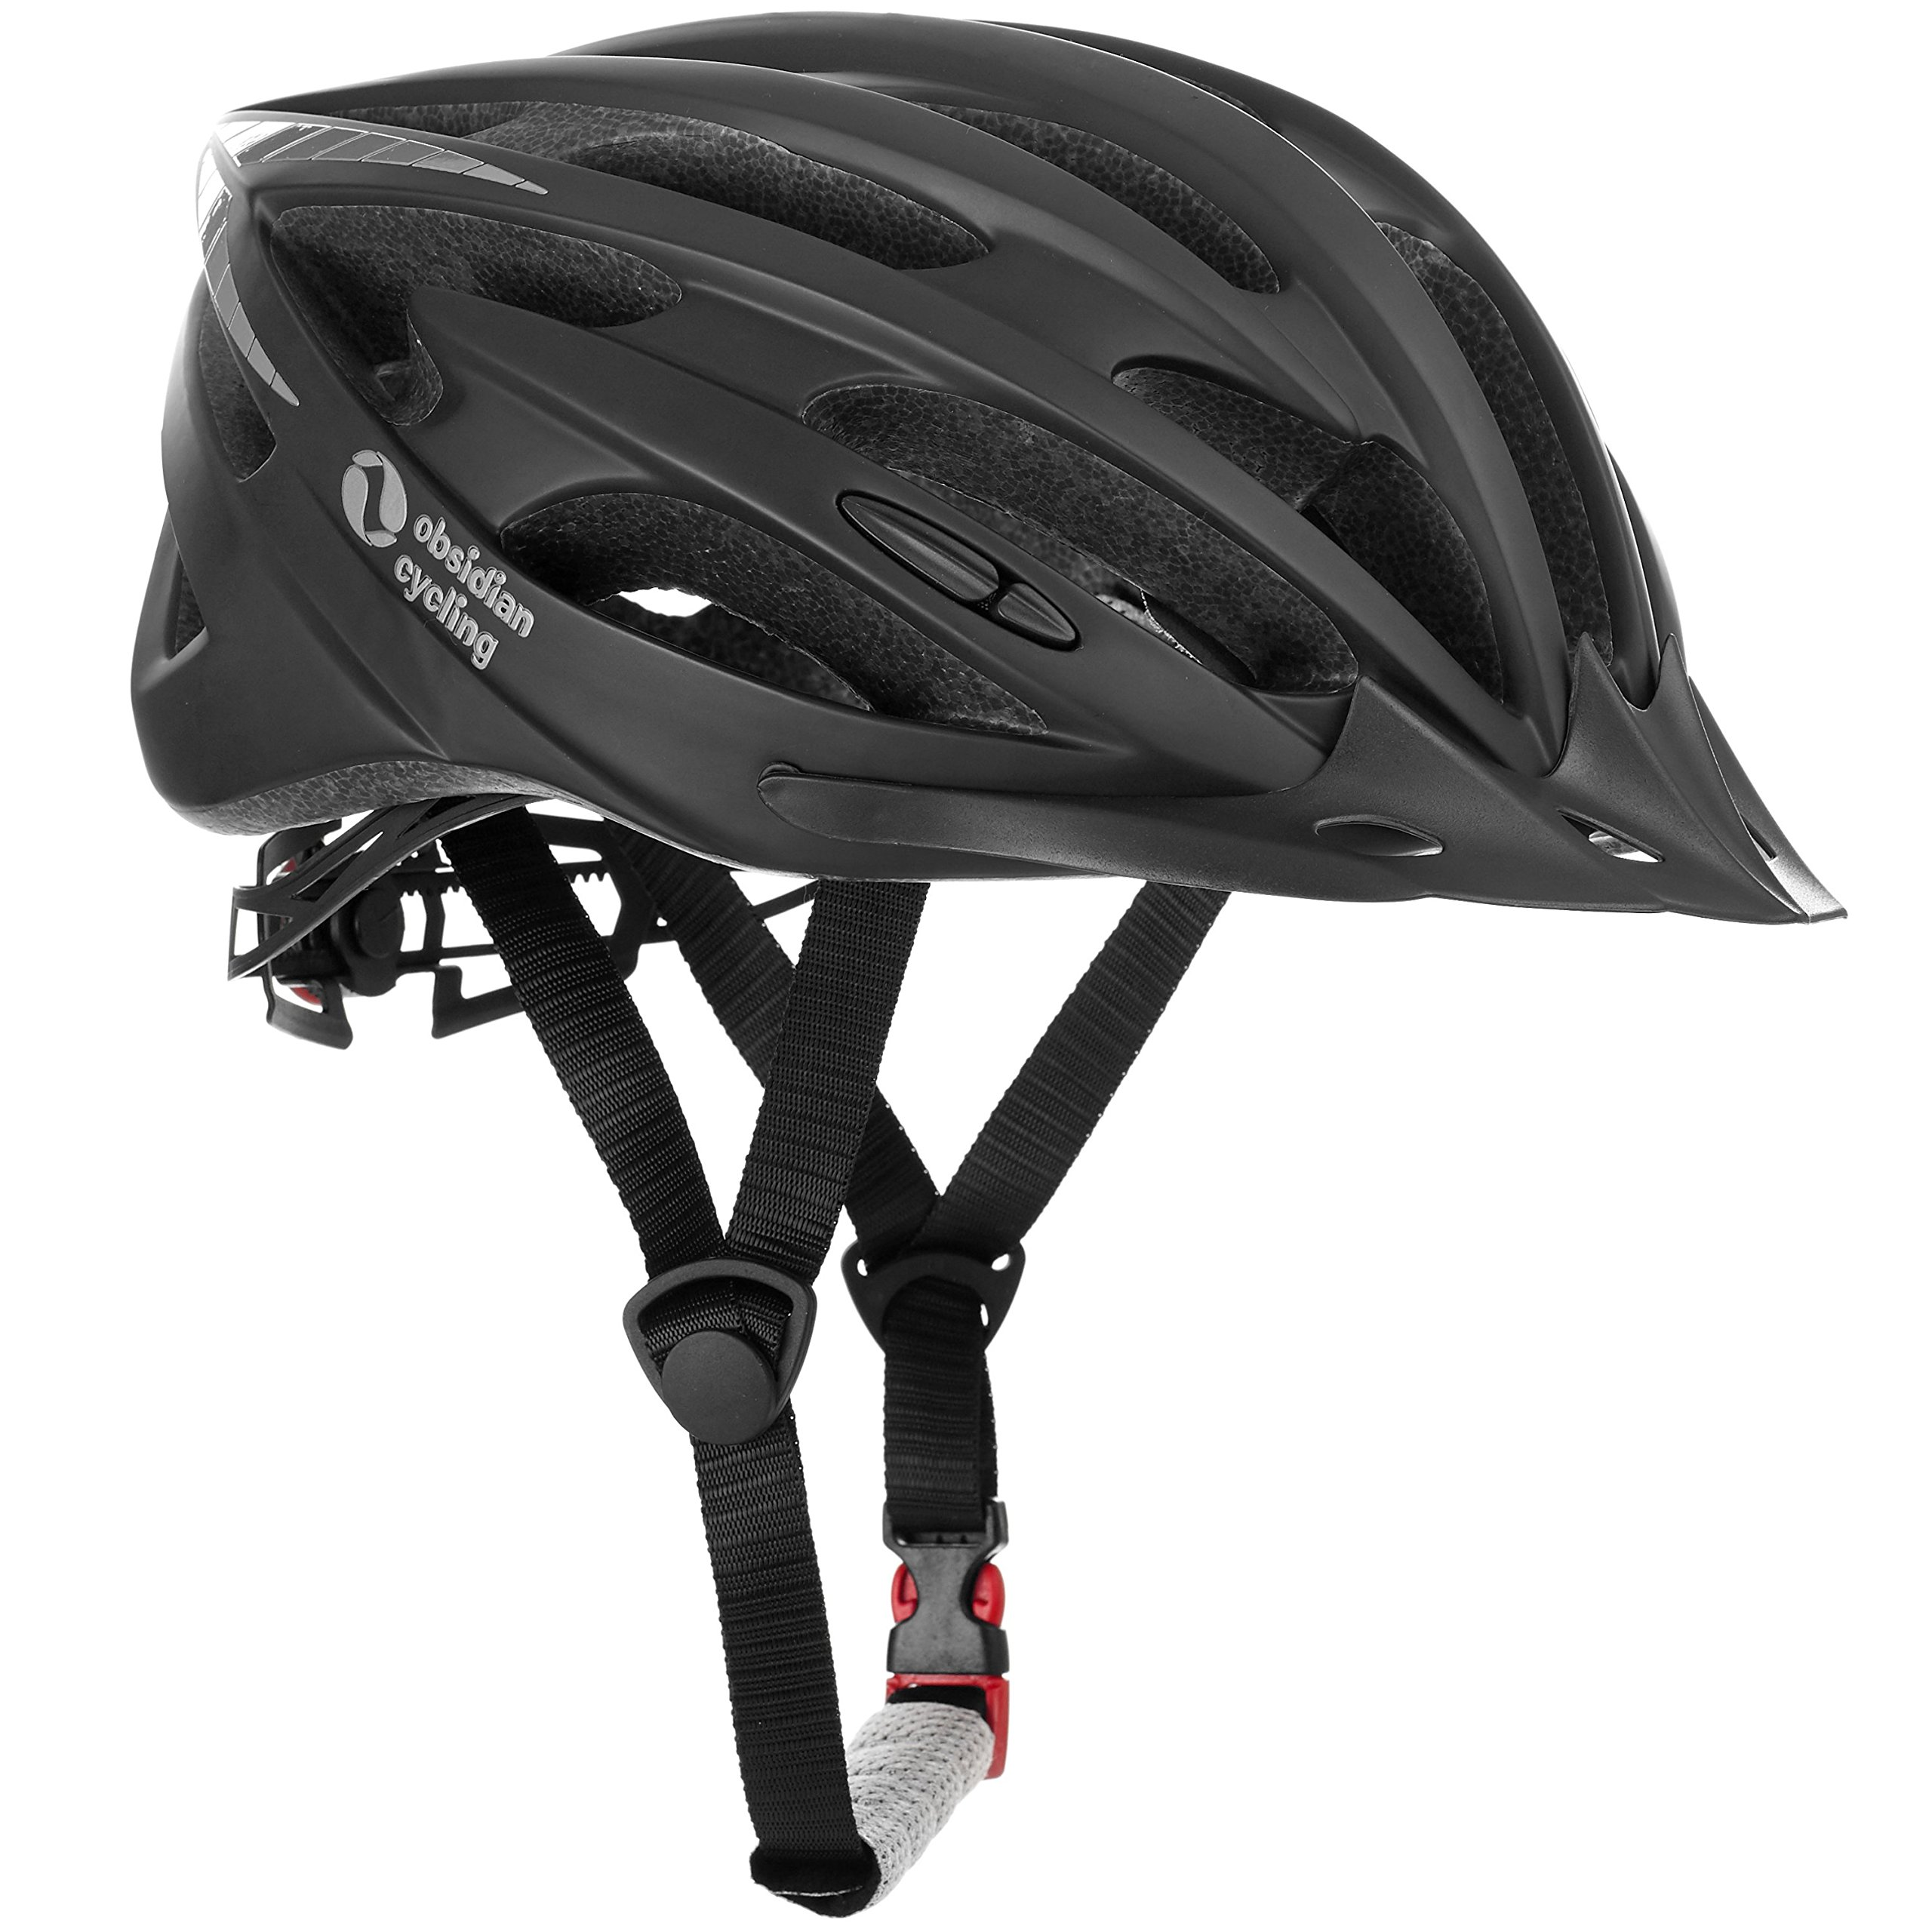 TeamObsidian Airflow Bike Helmet with in-Molded Reinforcing Skeleton for  Added Protection - Adult Size 7c0c1d84b469